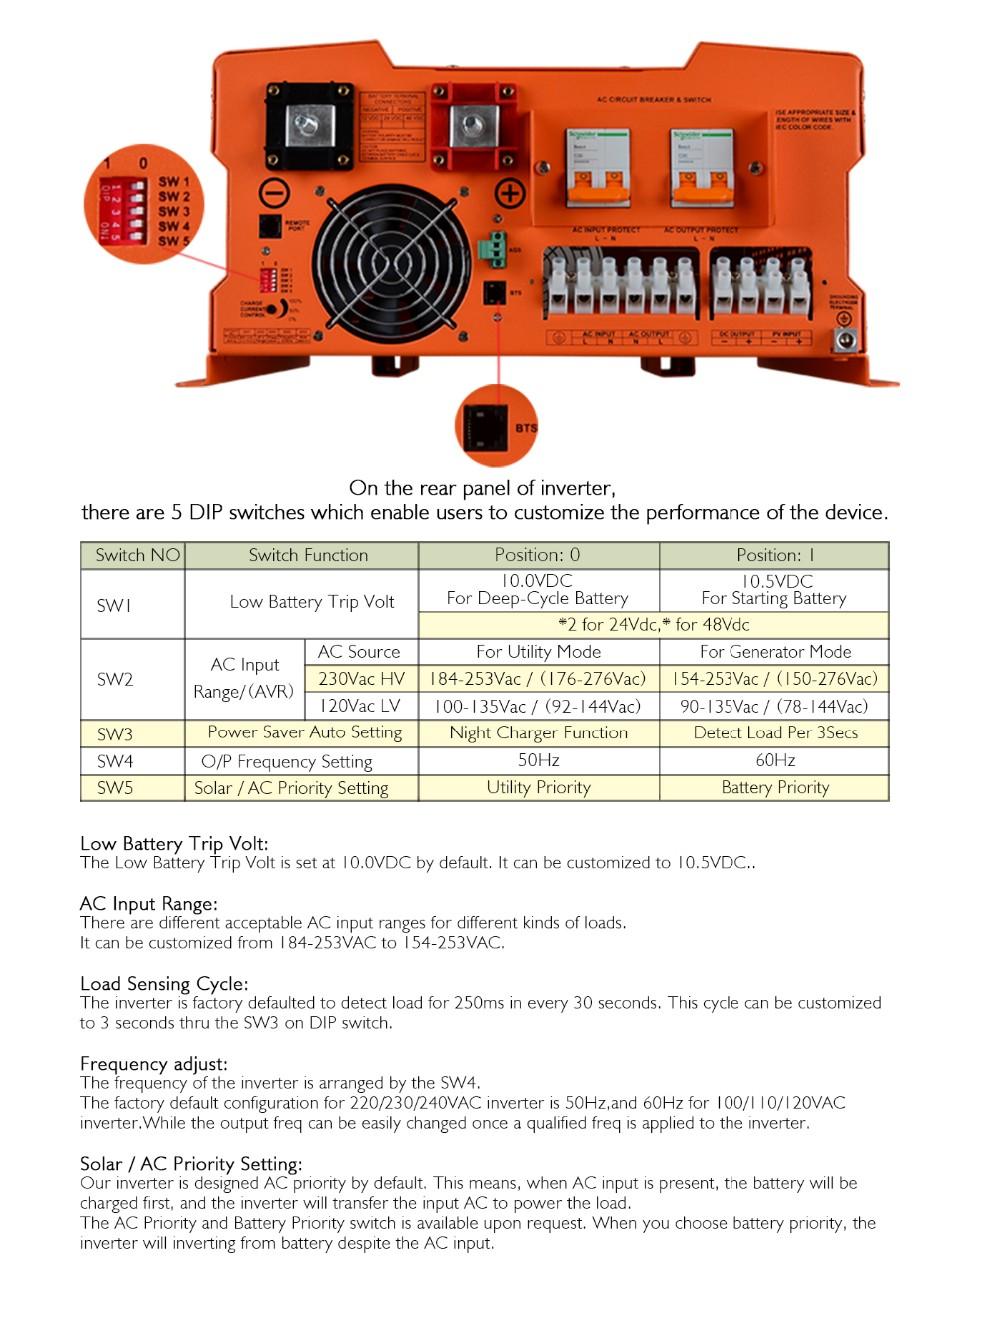 medium resolution of  yiy 12000w power inverter dc 48v ac 220v circuit diagram shenzhen inverter for single